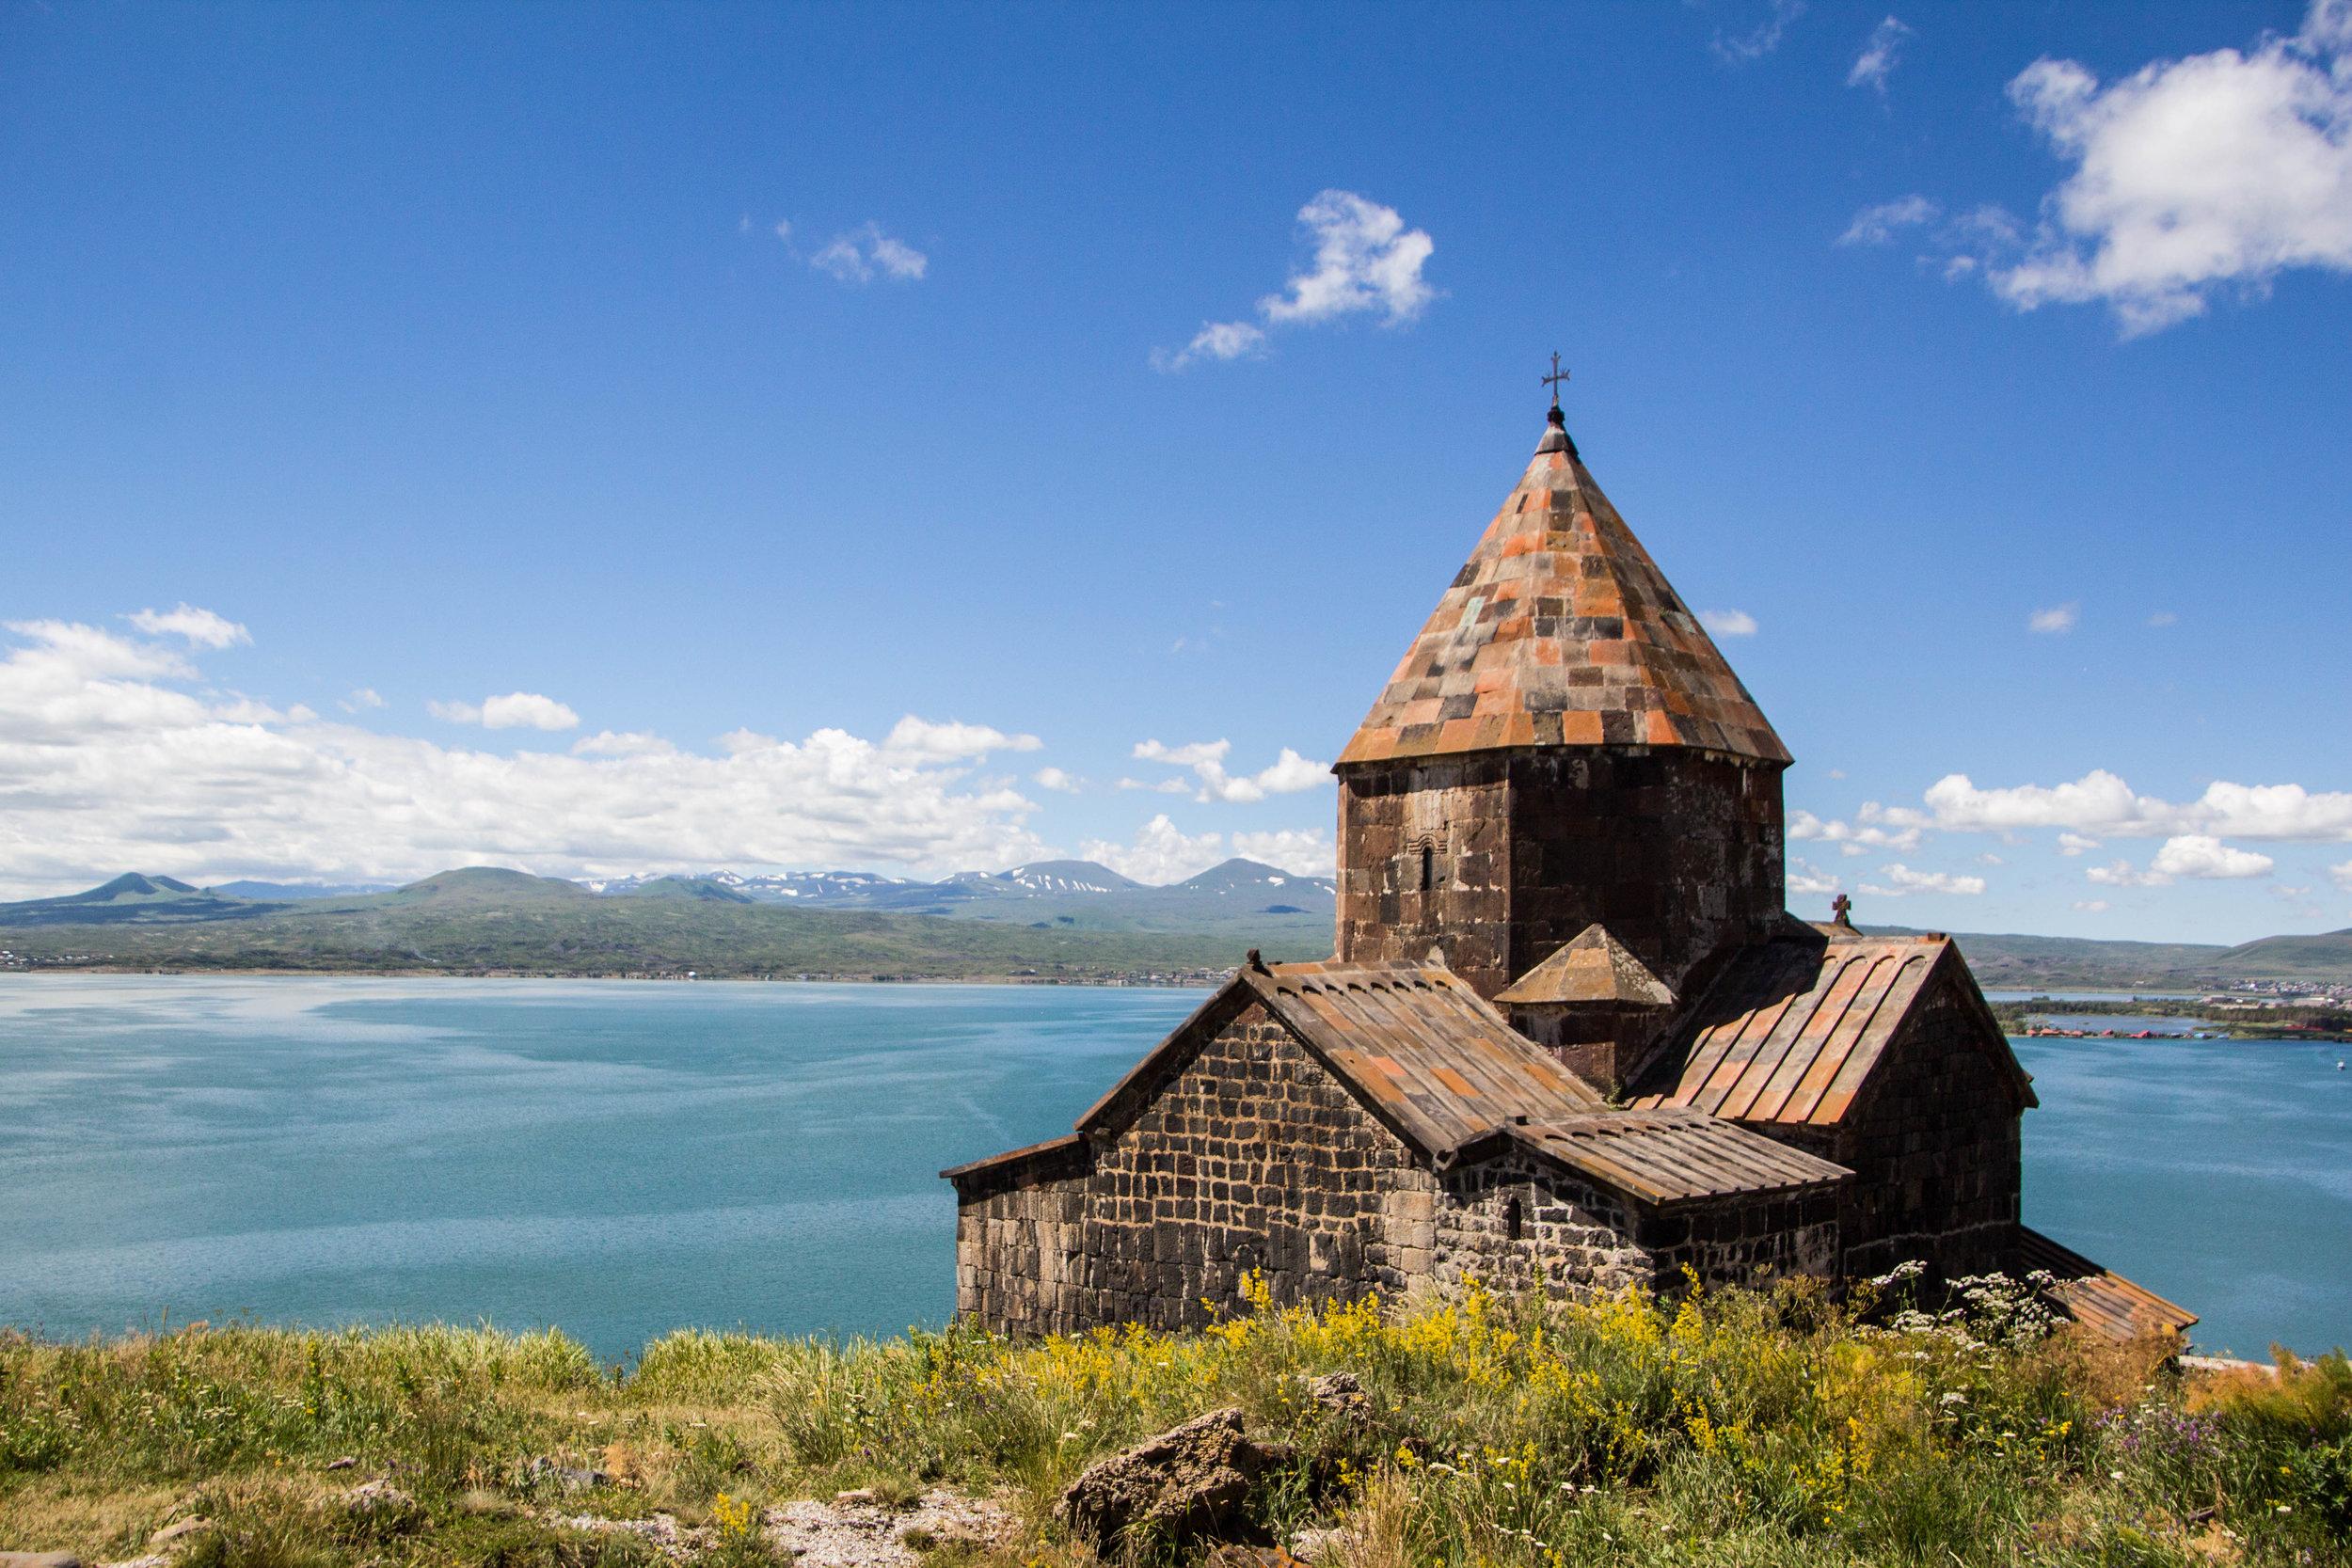 sevanavank-lake-sevan-armenia-26.jpg